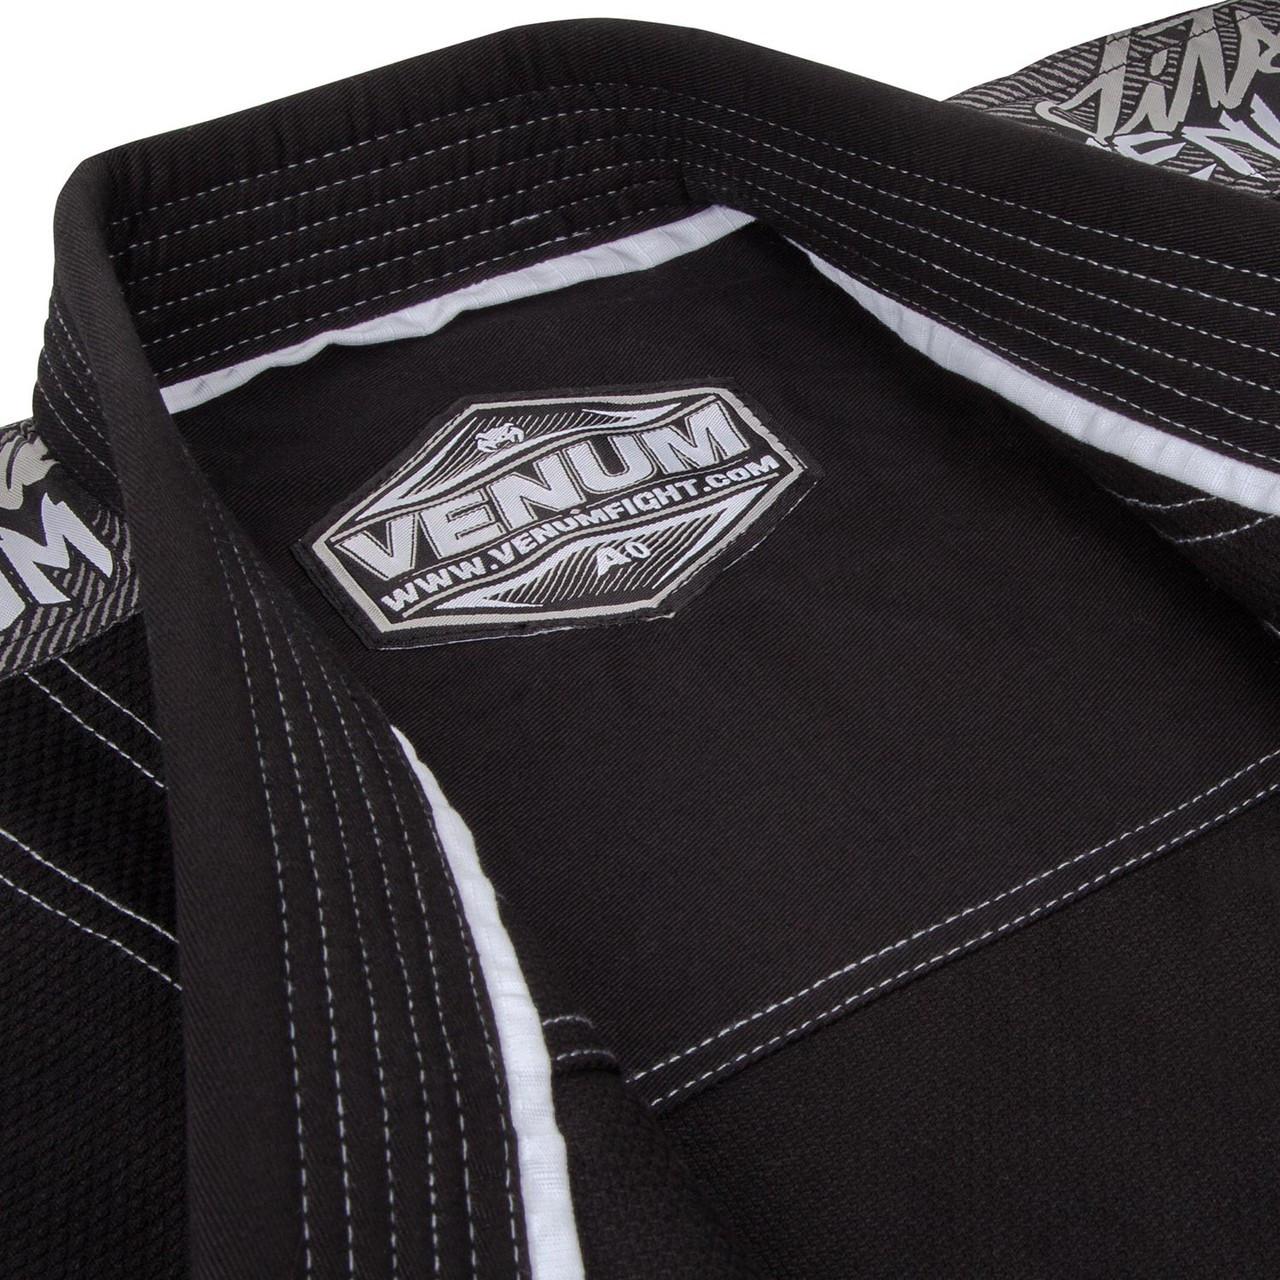 Black and Grey Venum Challenger 3.0 gi.